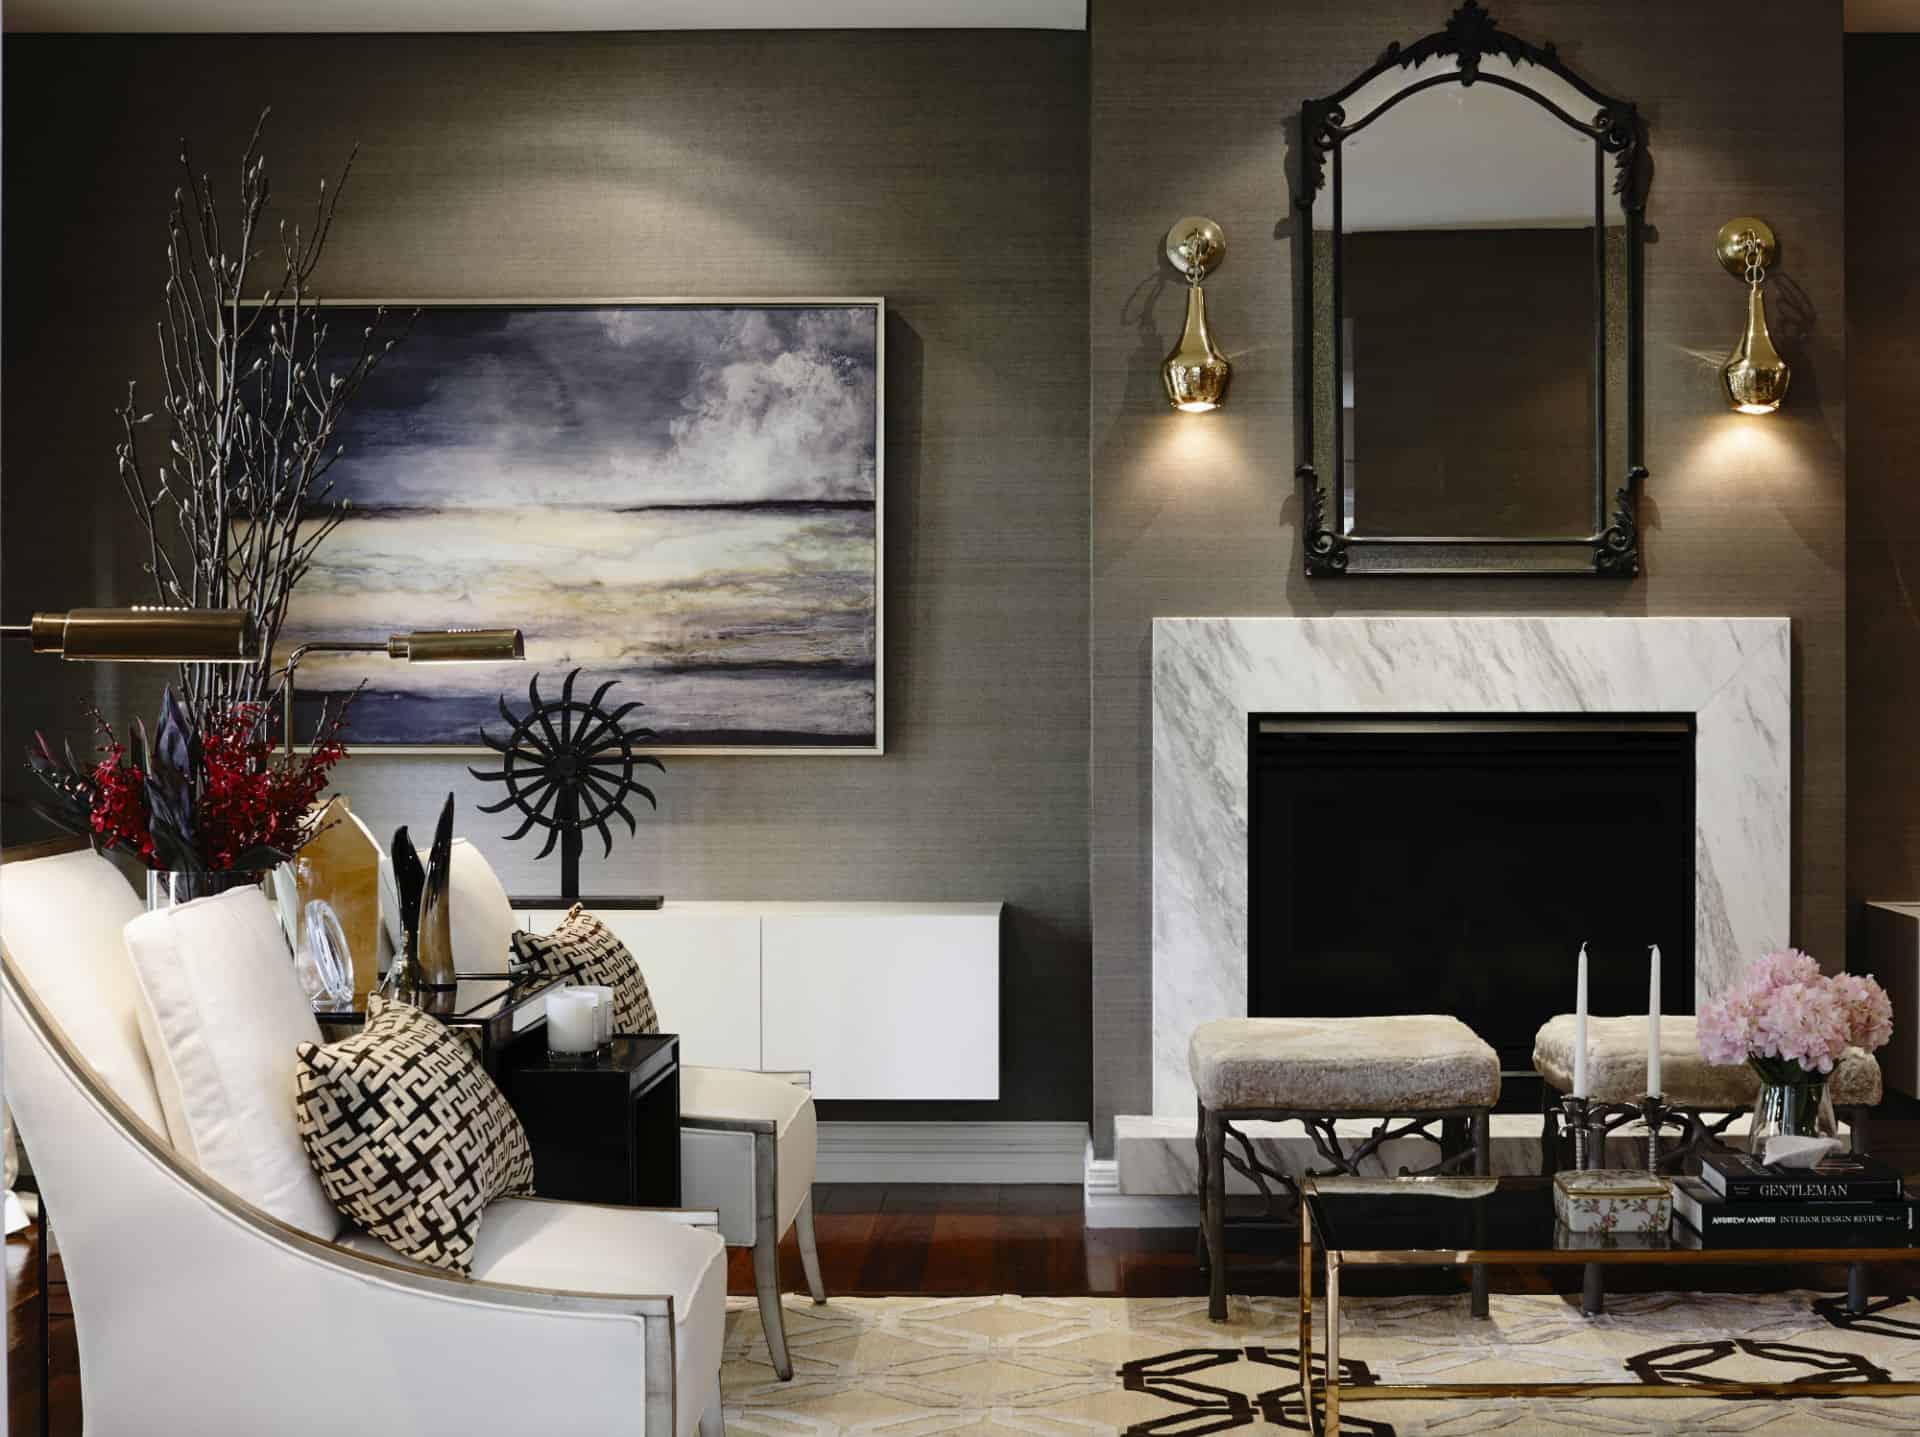 Malvern interior design